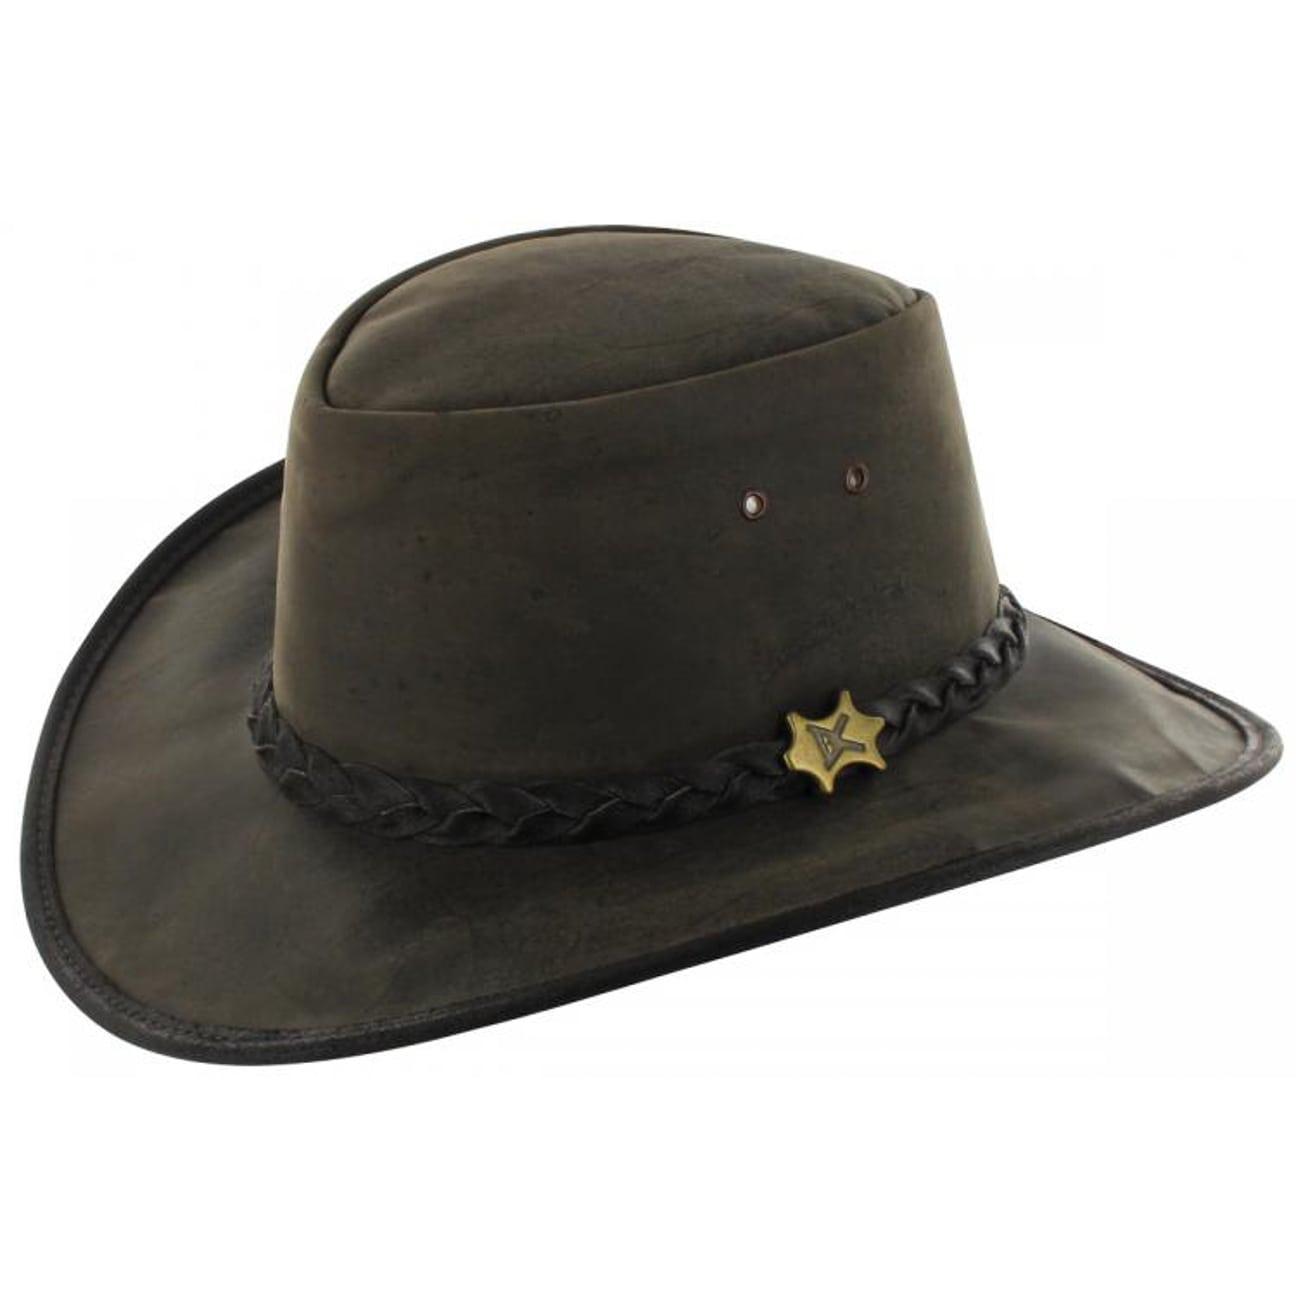 Sombrero Kangaroo Bushwalker by BC HATS  sombrero outdoor